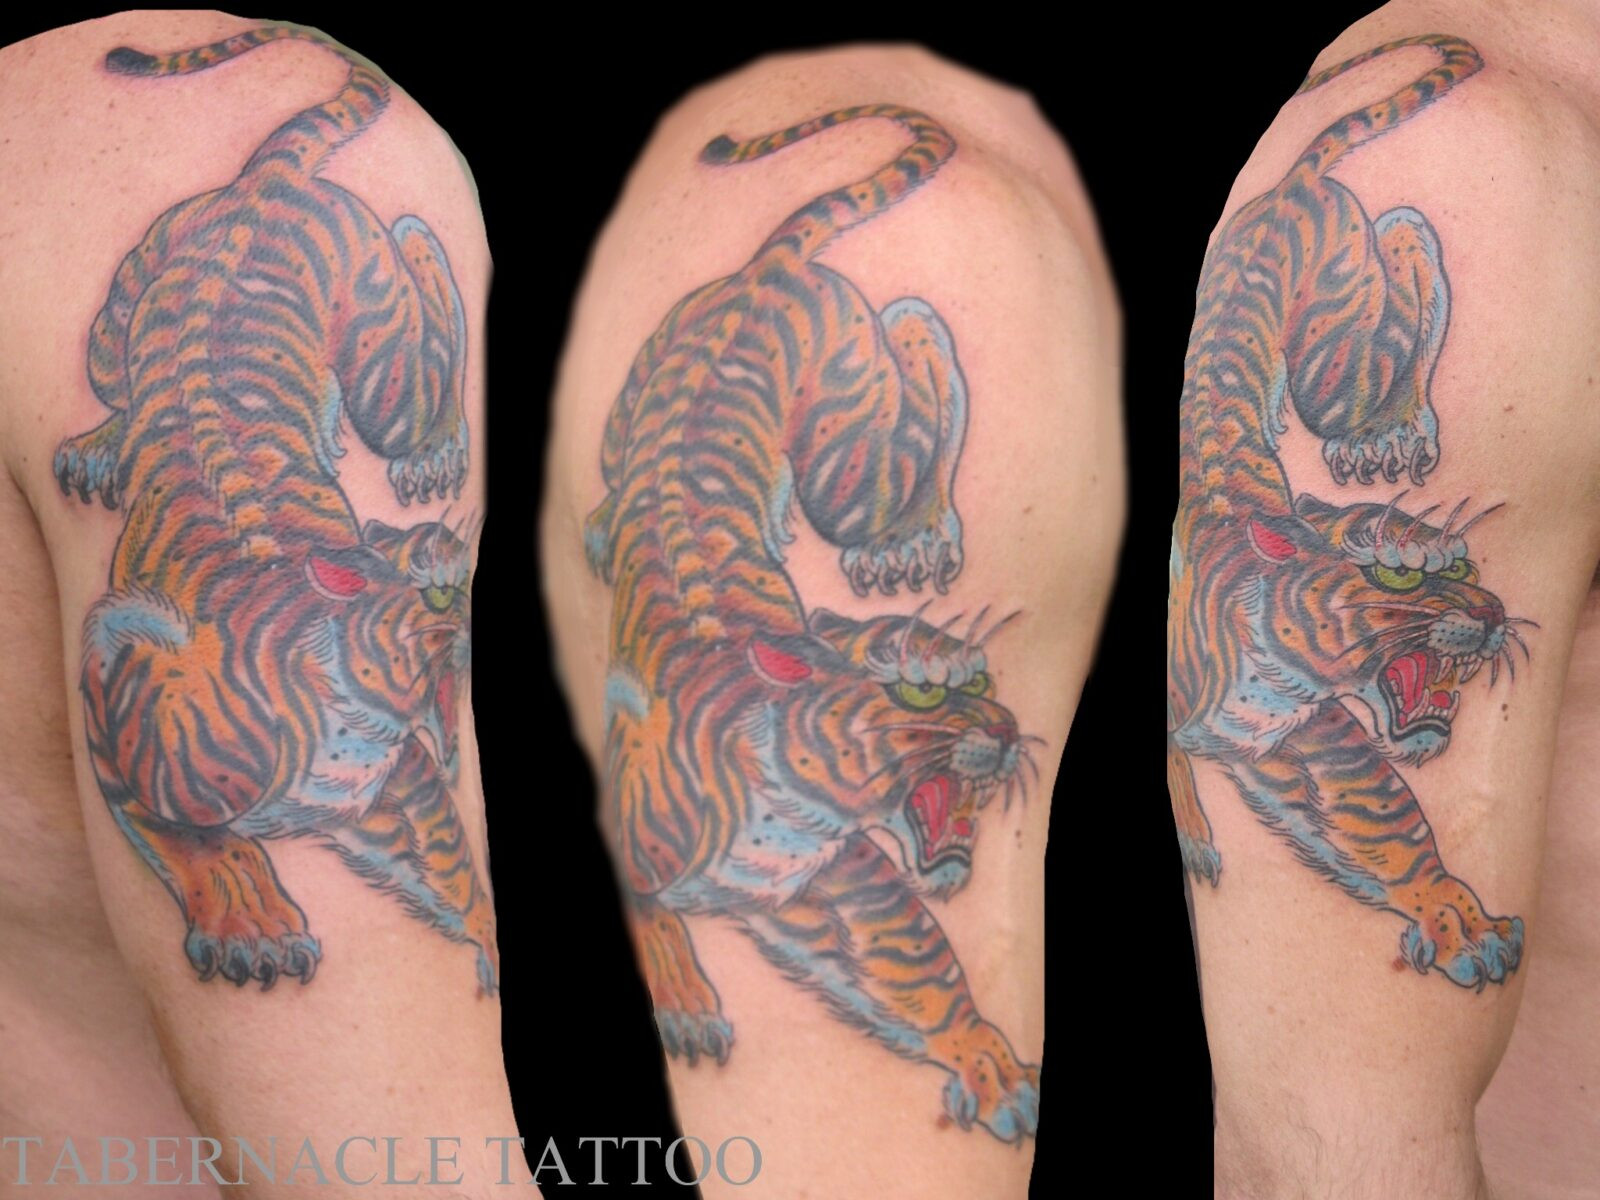 Tiger half sleeve tattoo